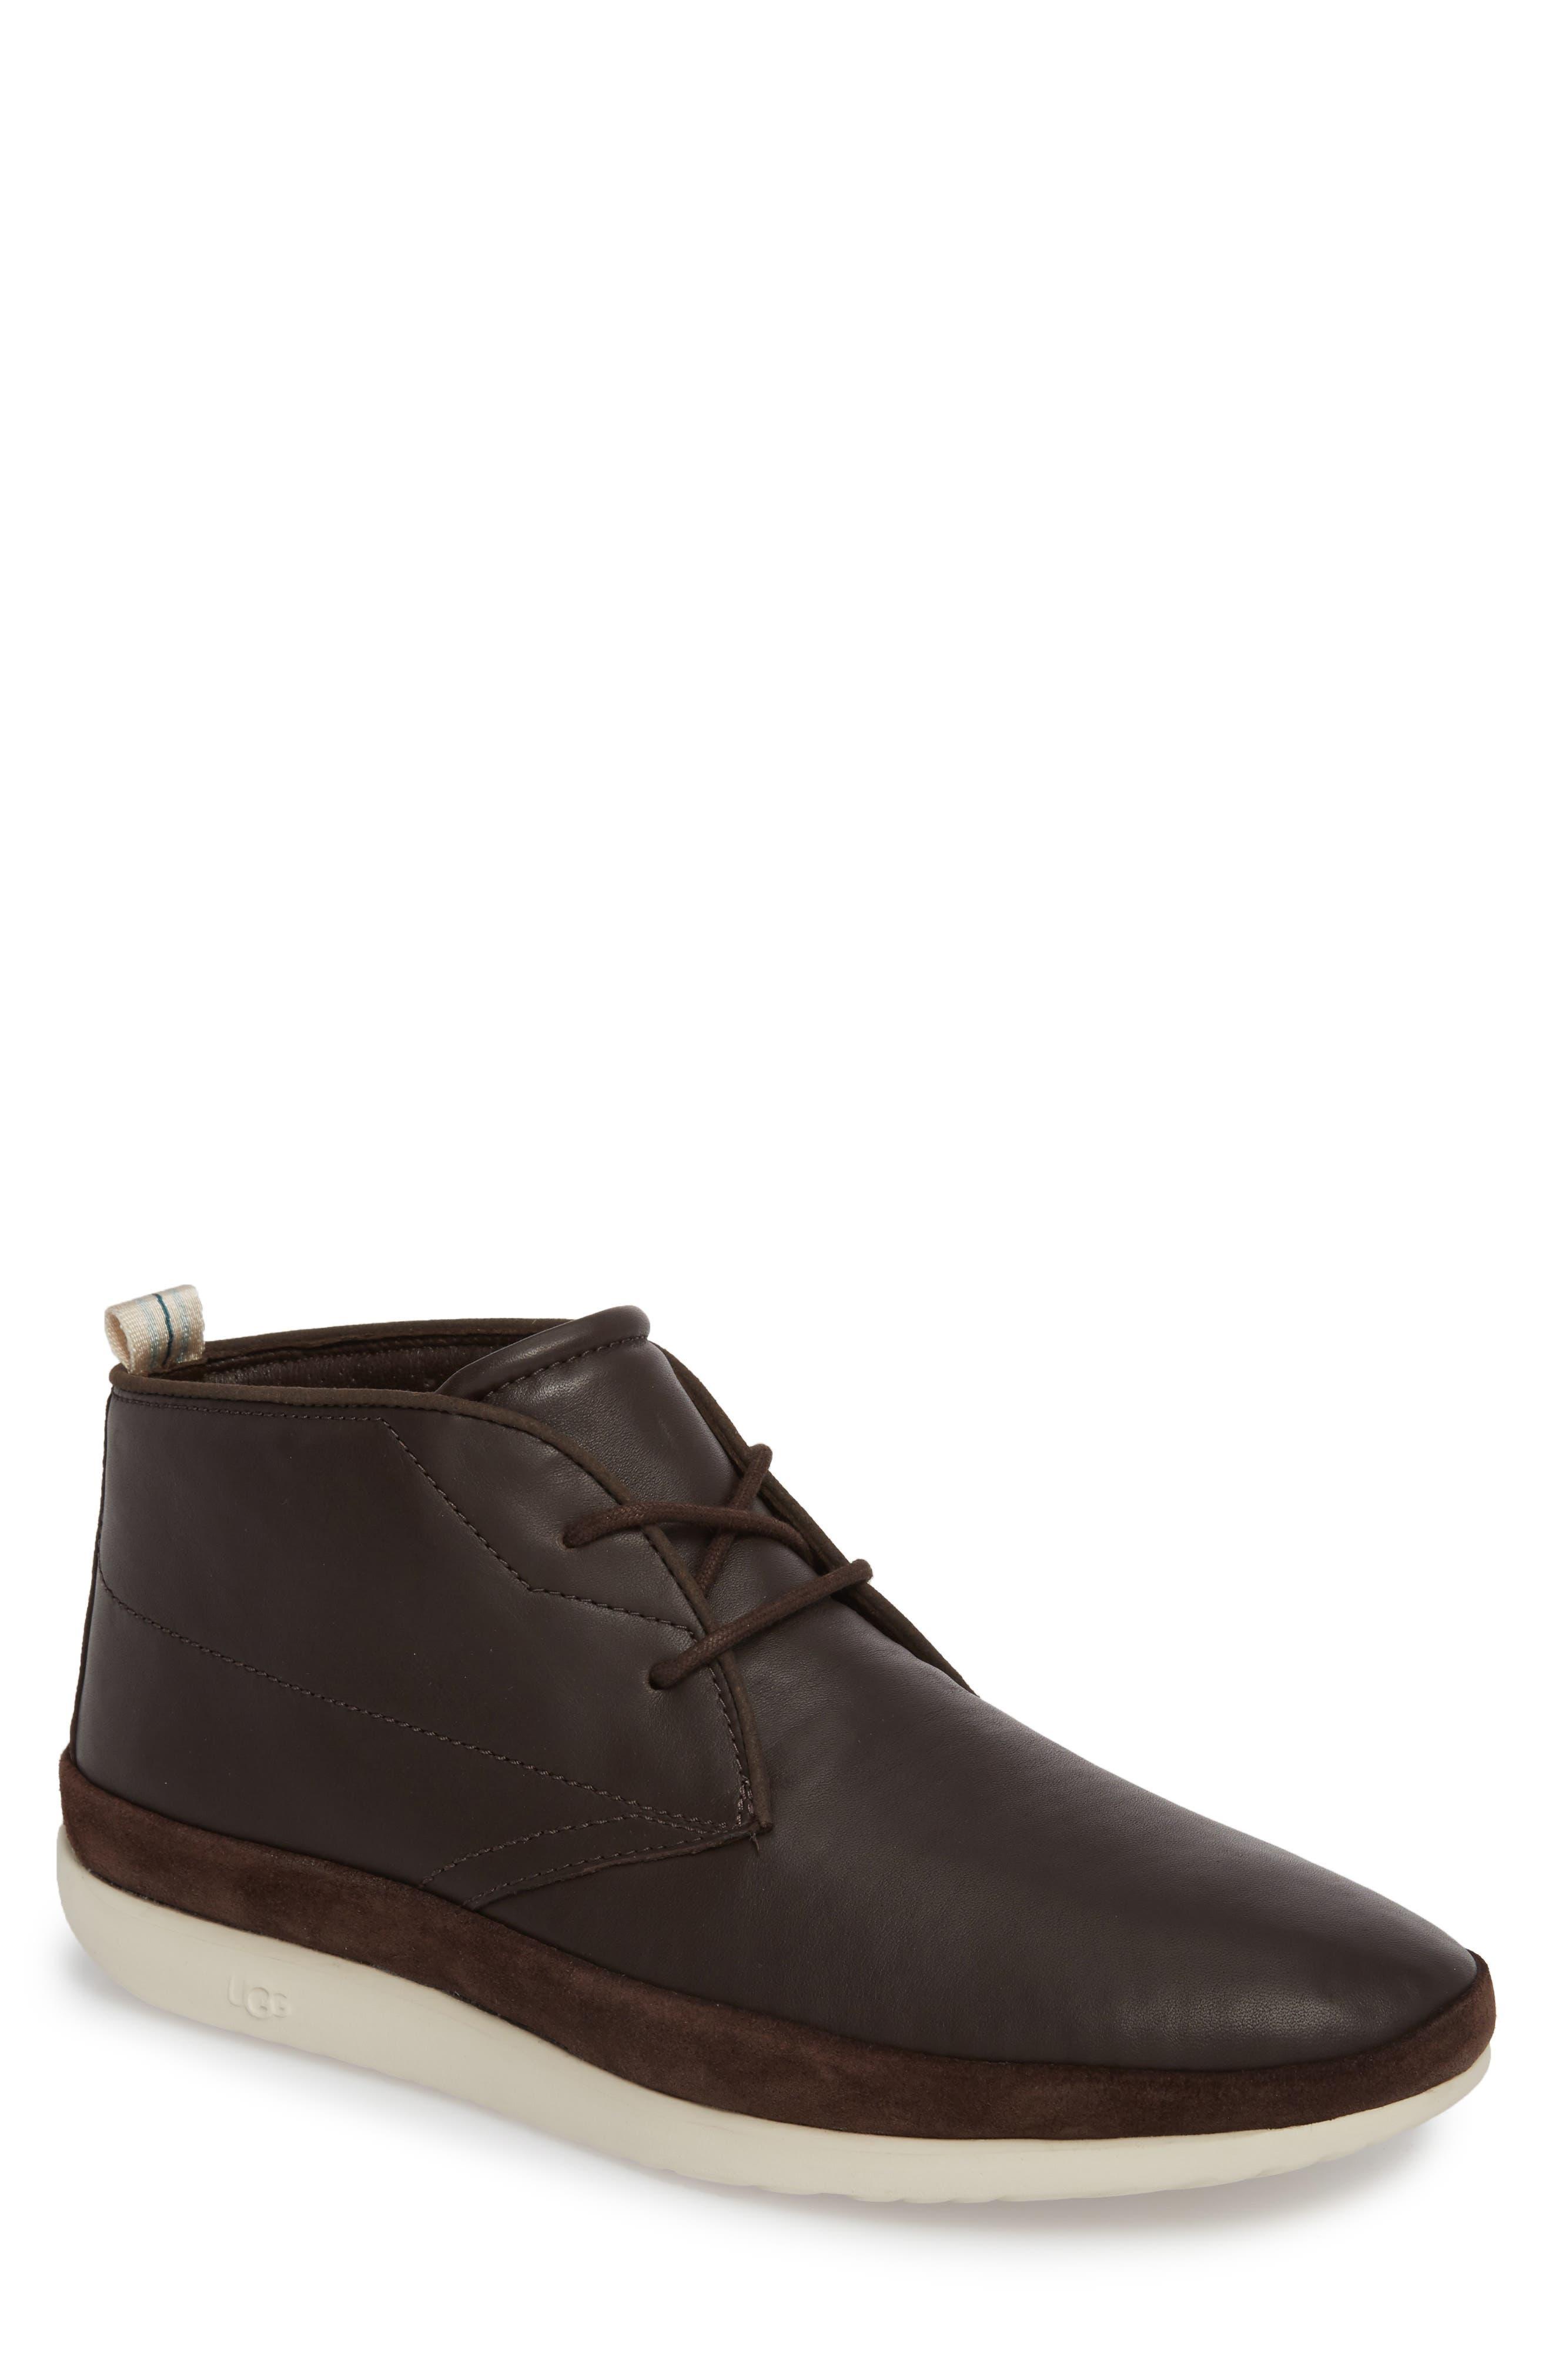 Cali Chukka Boot,                         Main,                         color, Stout Leather